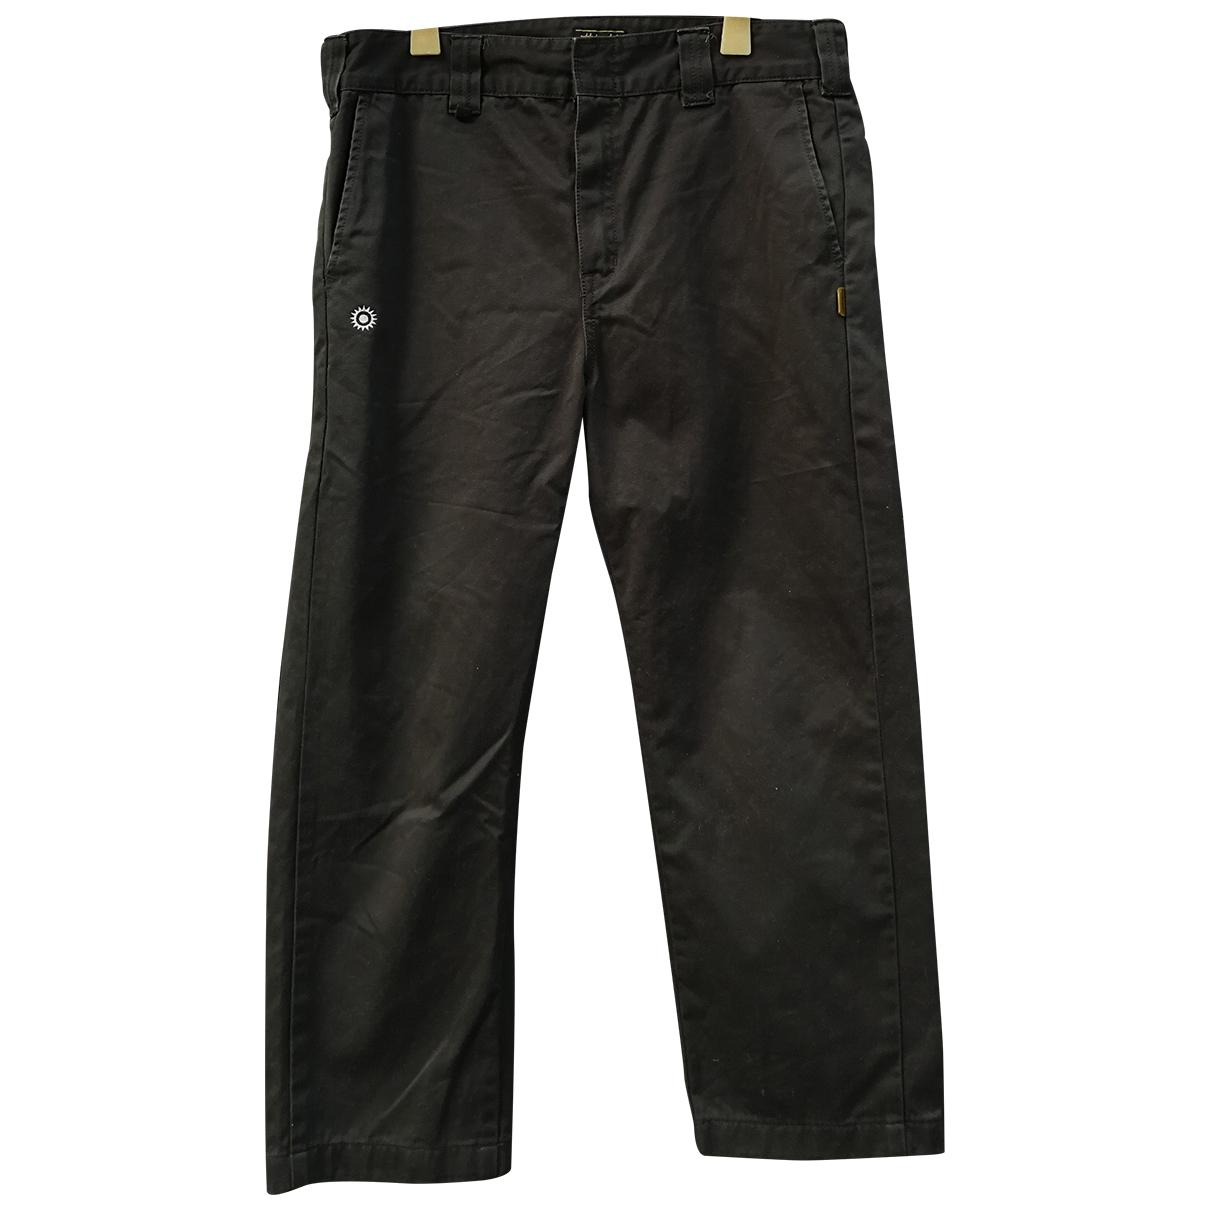 Pantalones en Algodon Marron Neighborhood